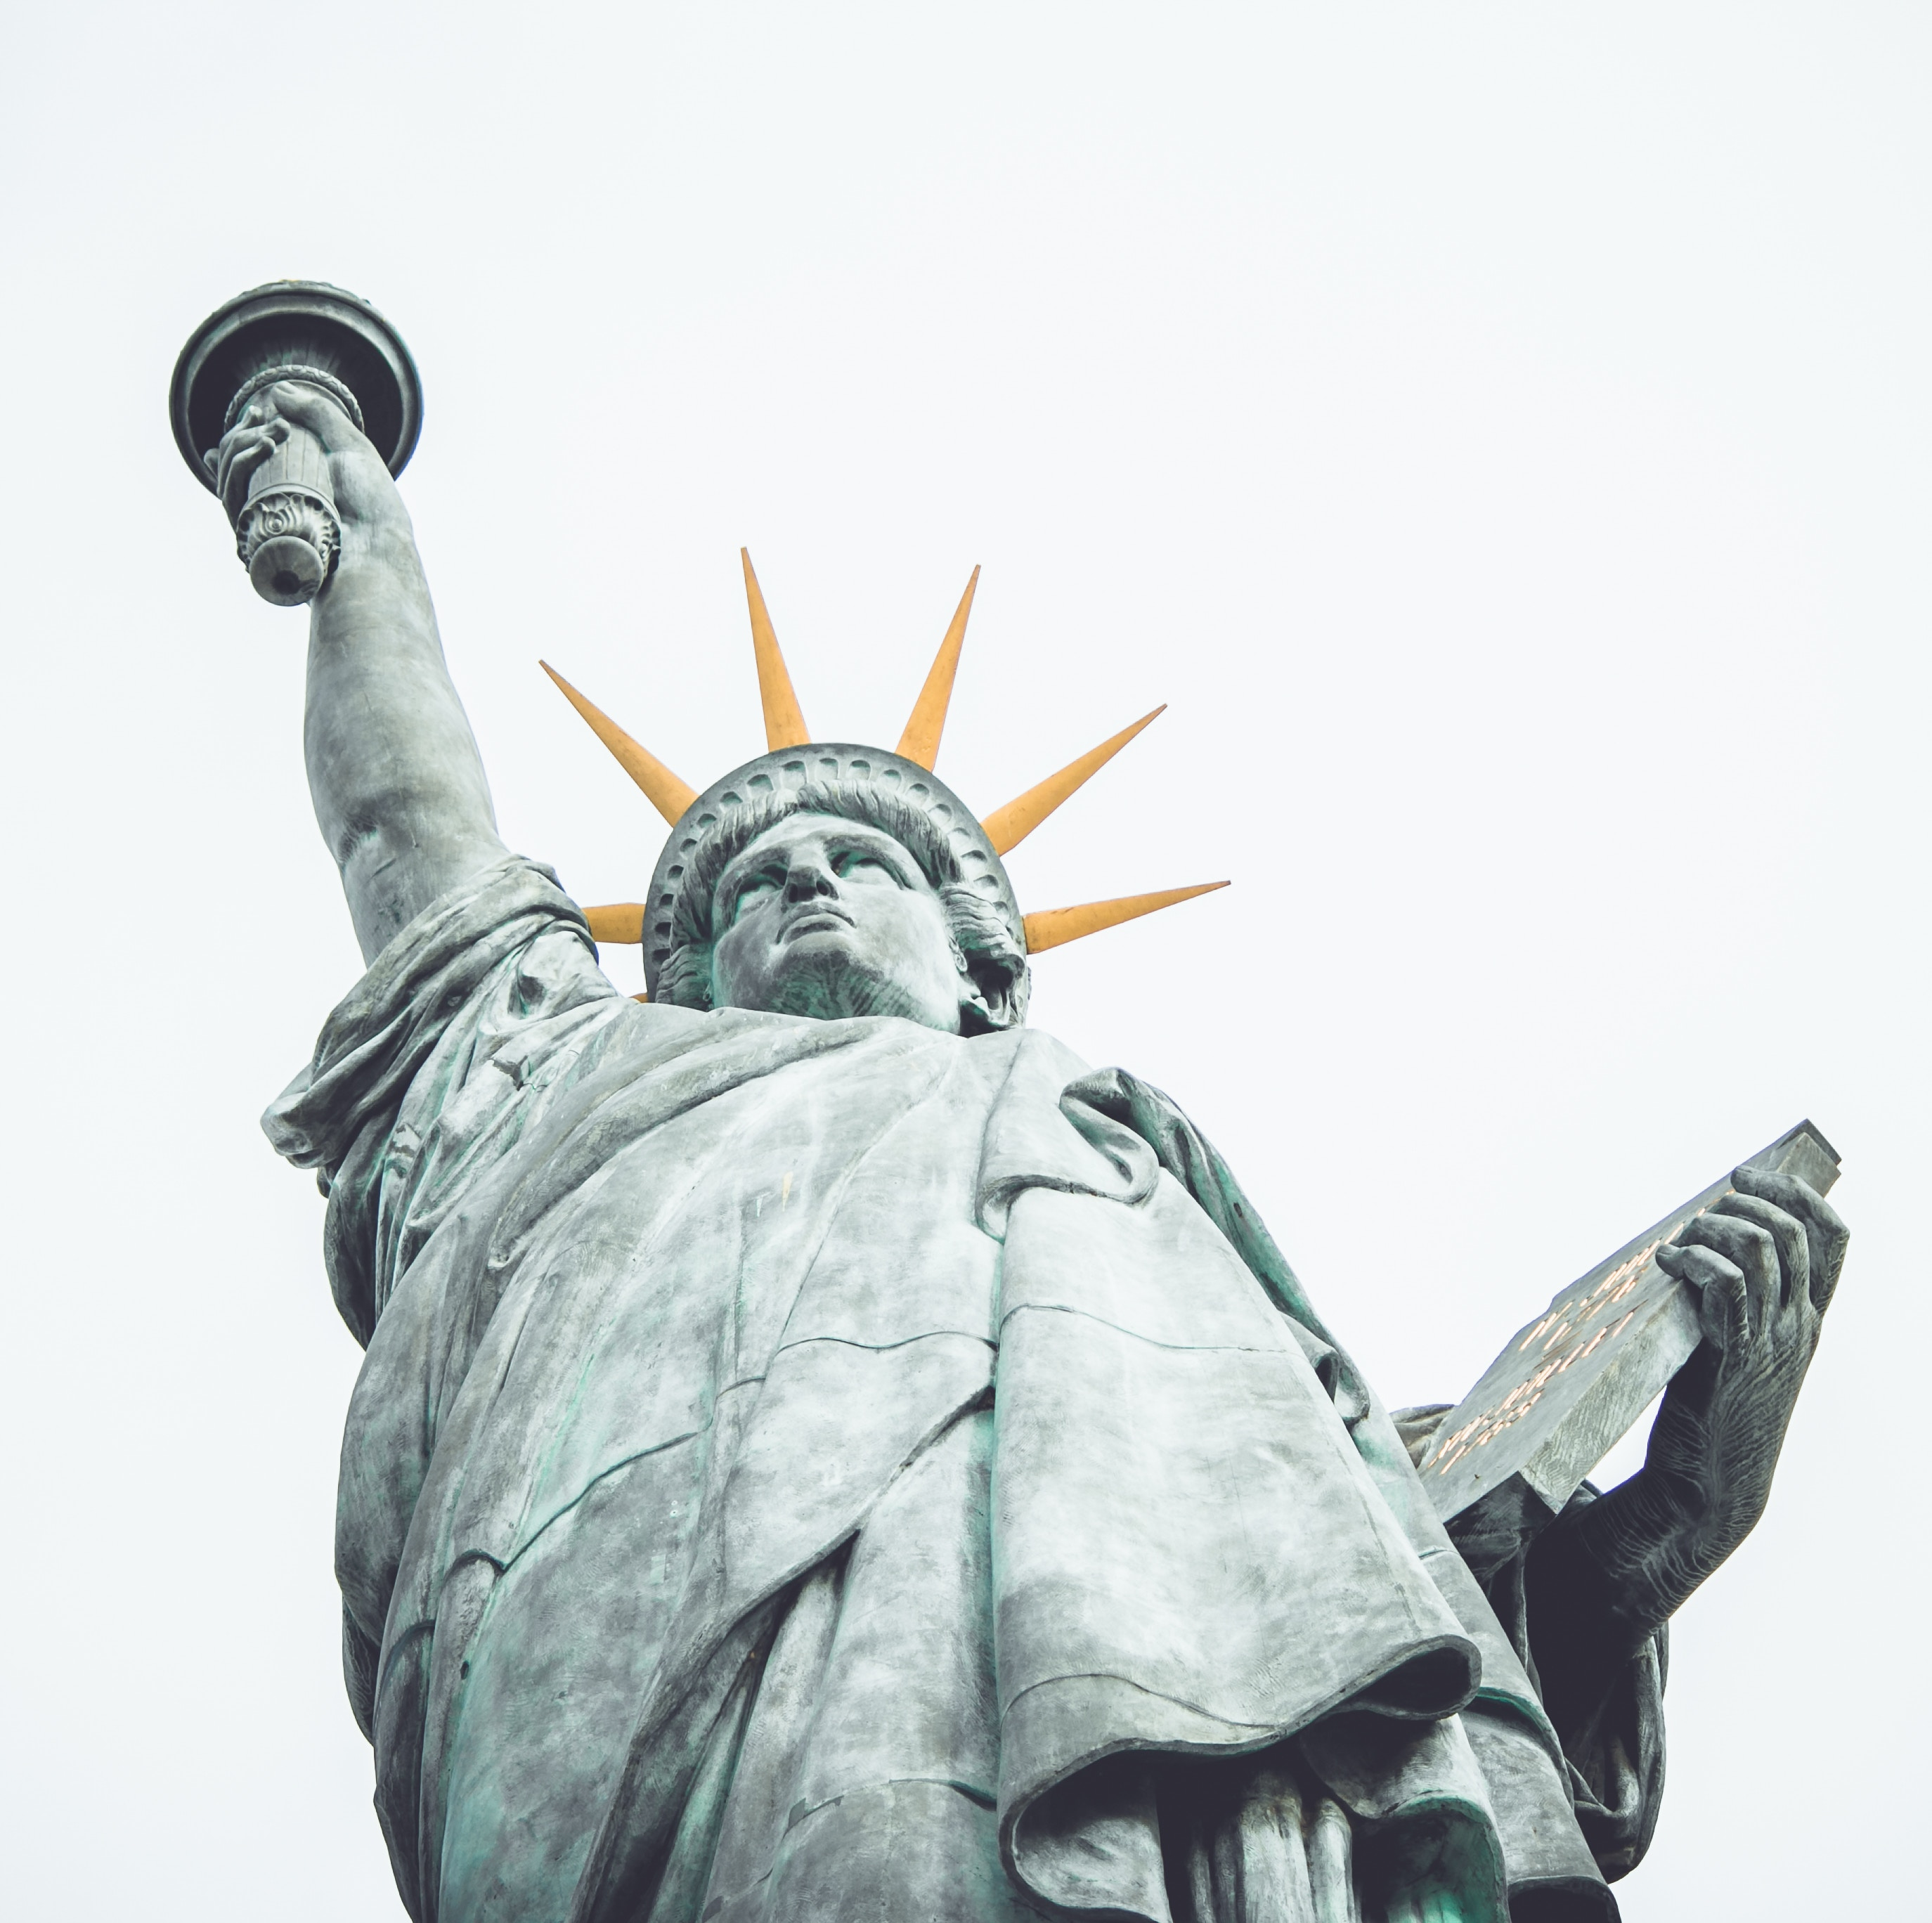 UNITED STATES OF AMERICA VISA